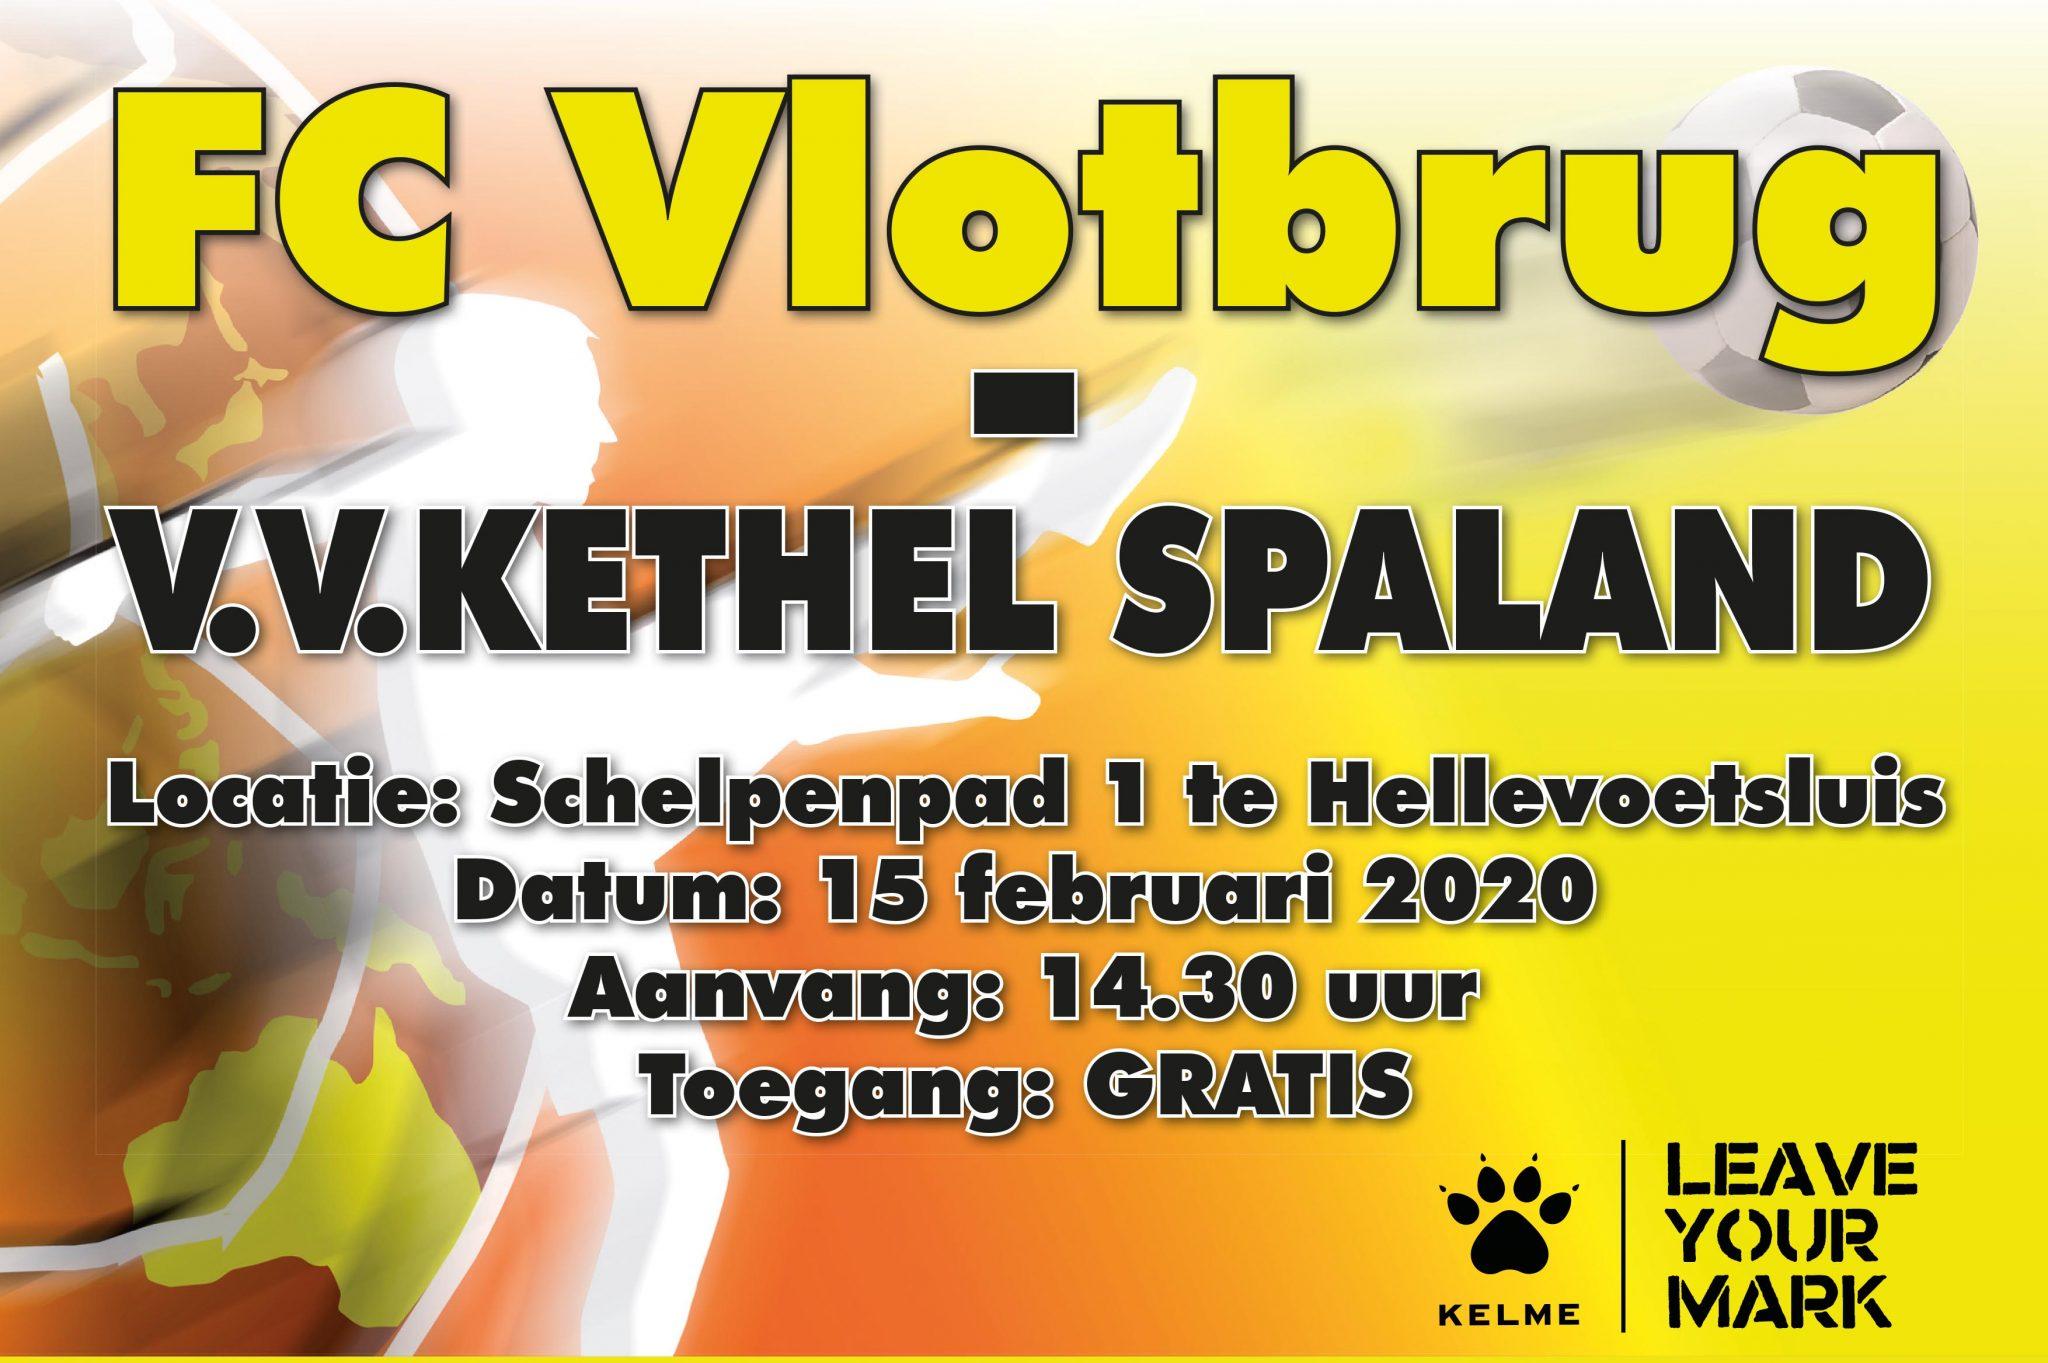 FC Vlotbrug - Kethel Spaland